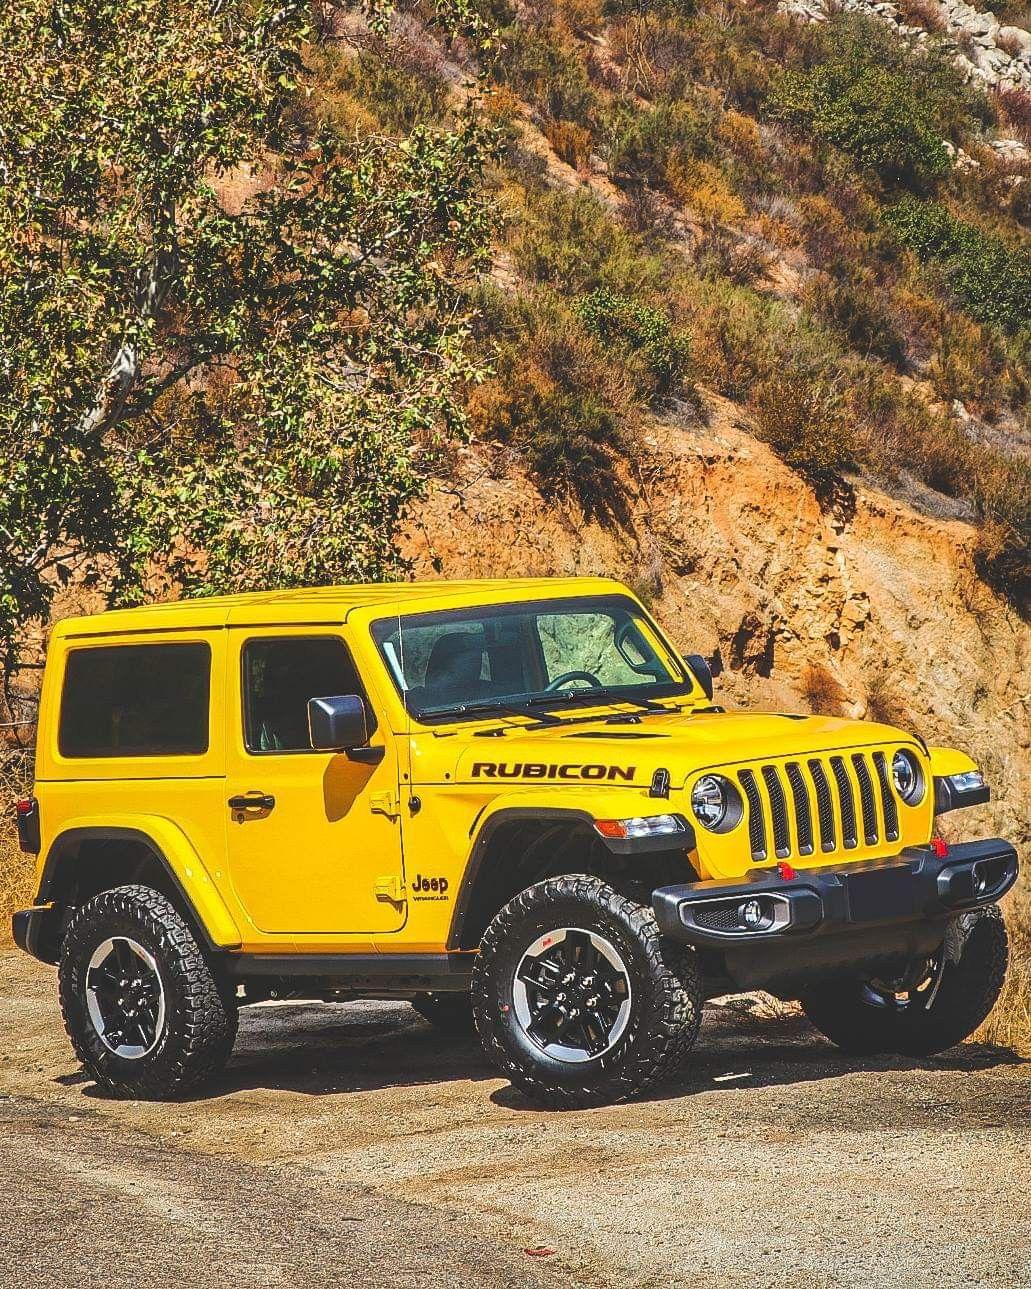 Rubicon Yellow Jeep Wrangler Jeep Jl Offroad Jeep